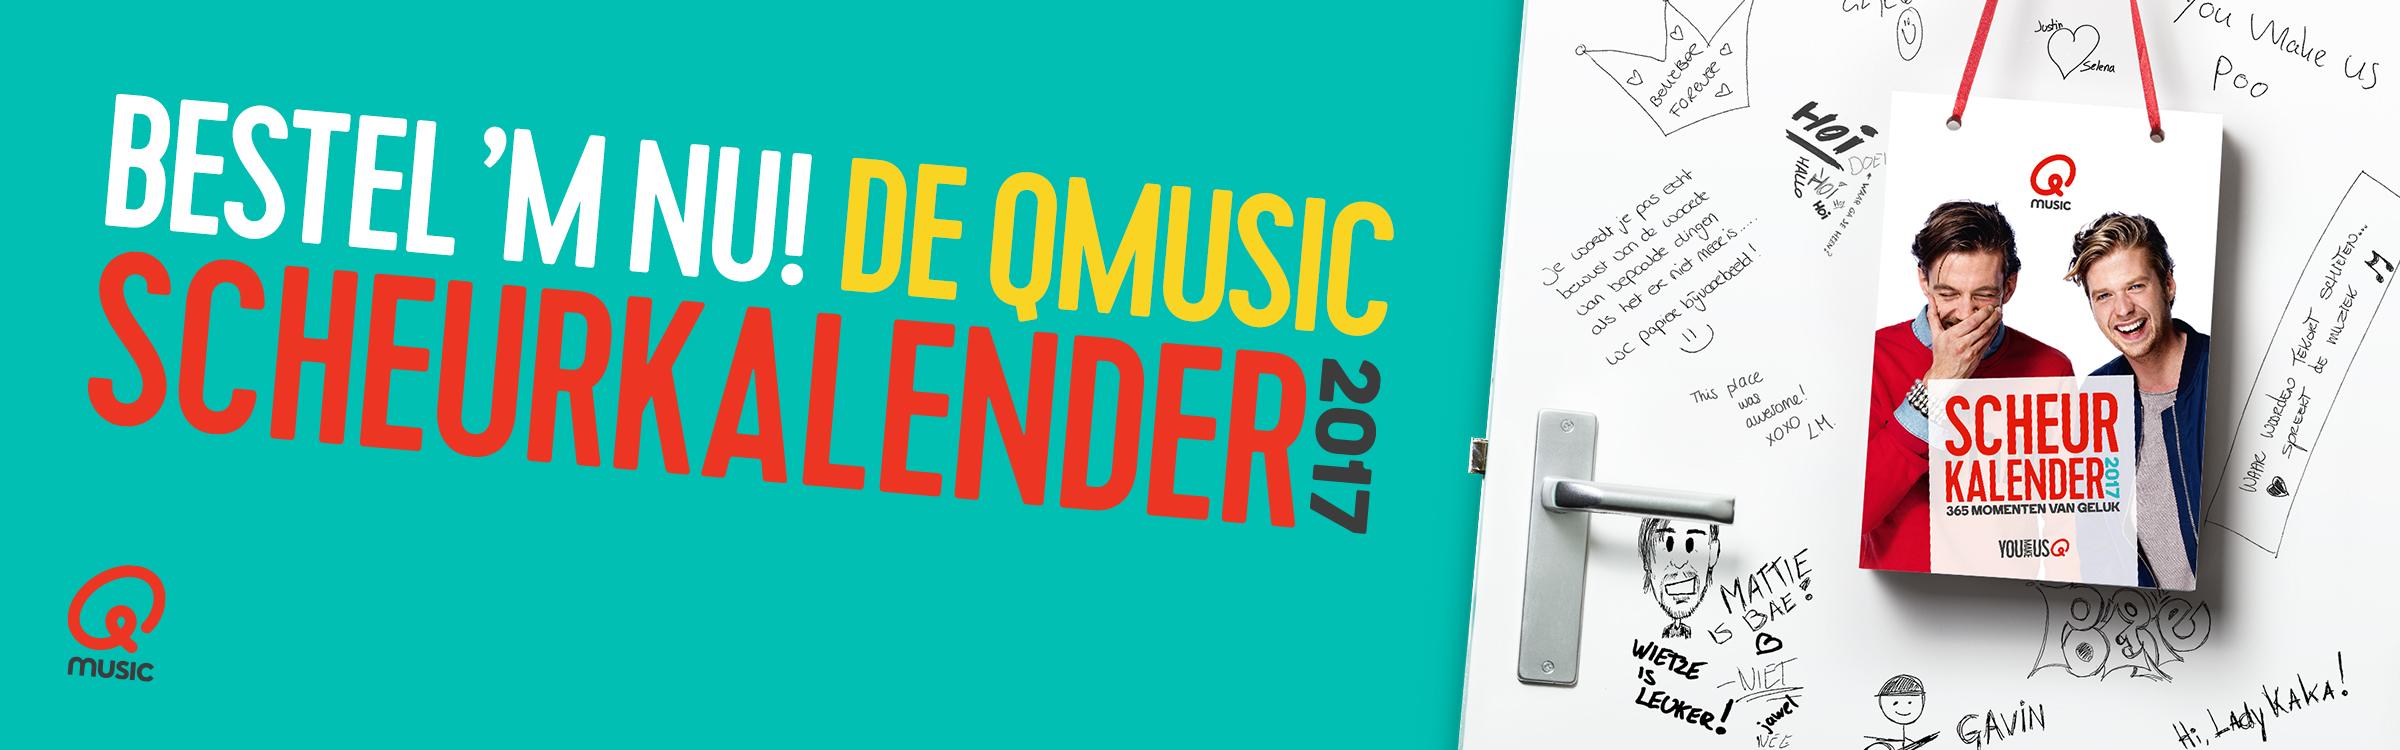 Qmusic actionheader scheurkalender2017